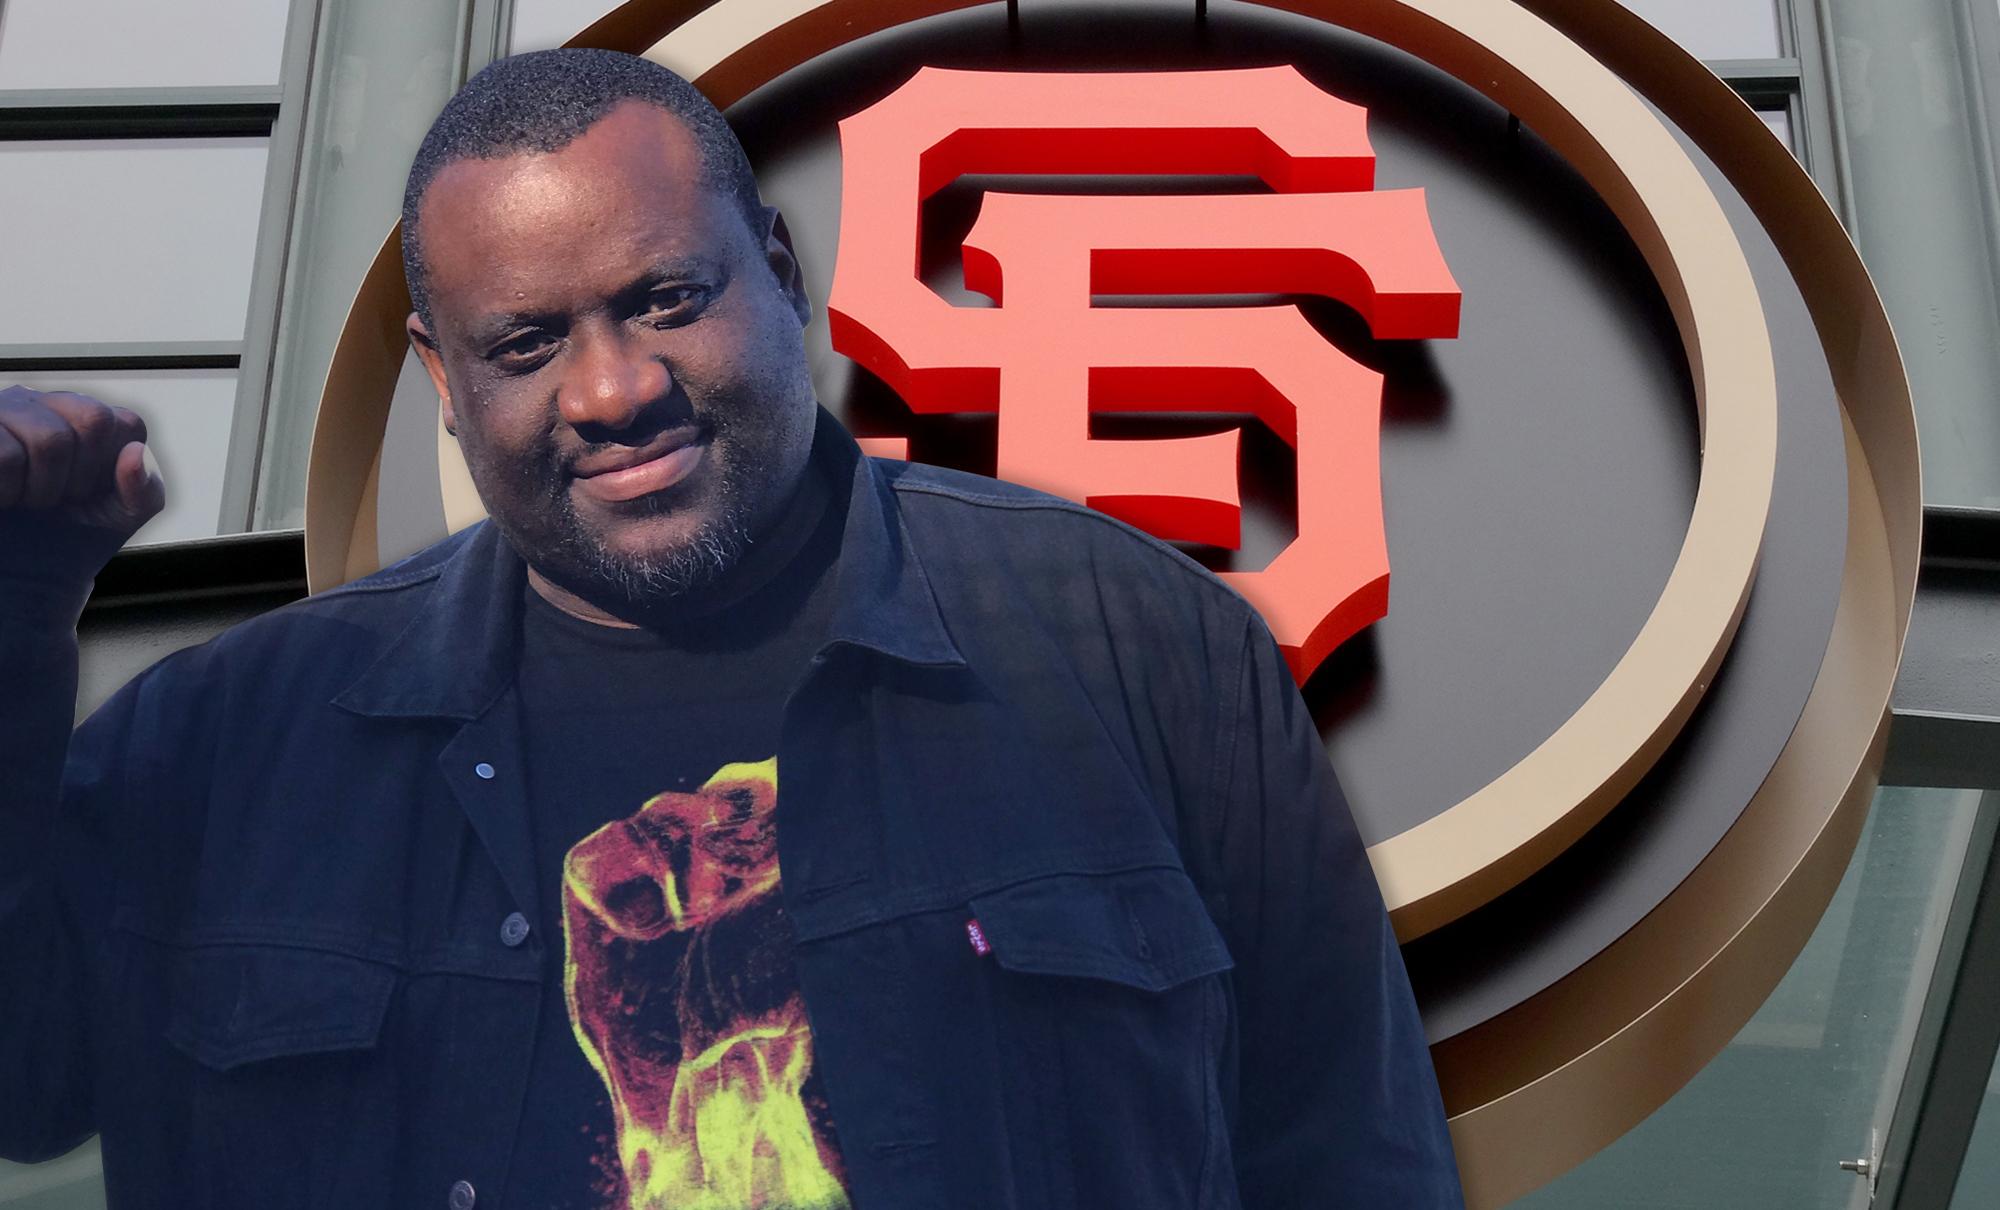 San Francisco Giants Community Advocate Program